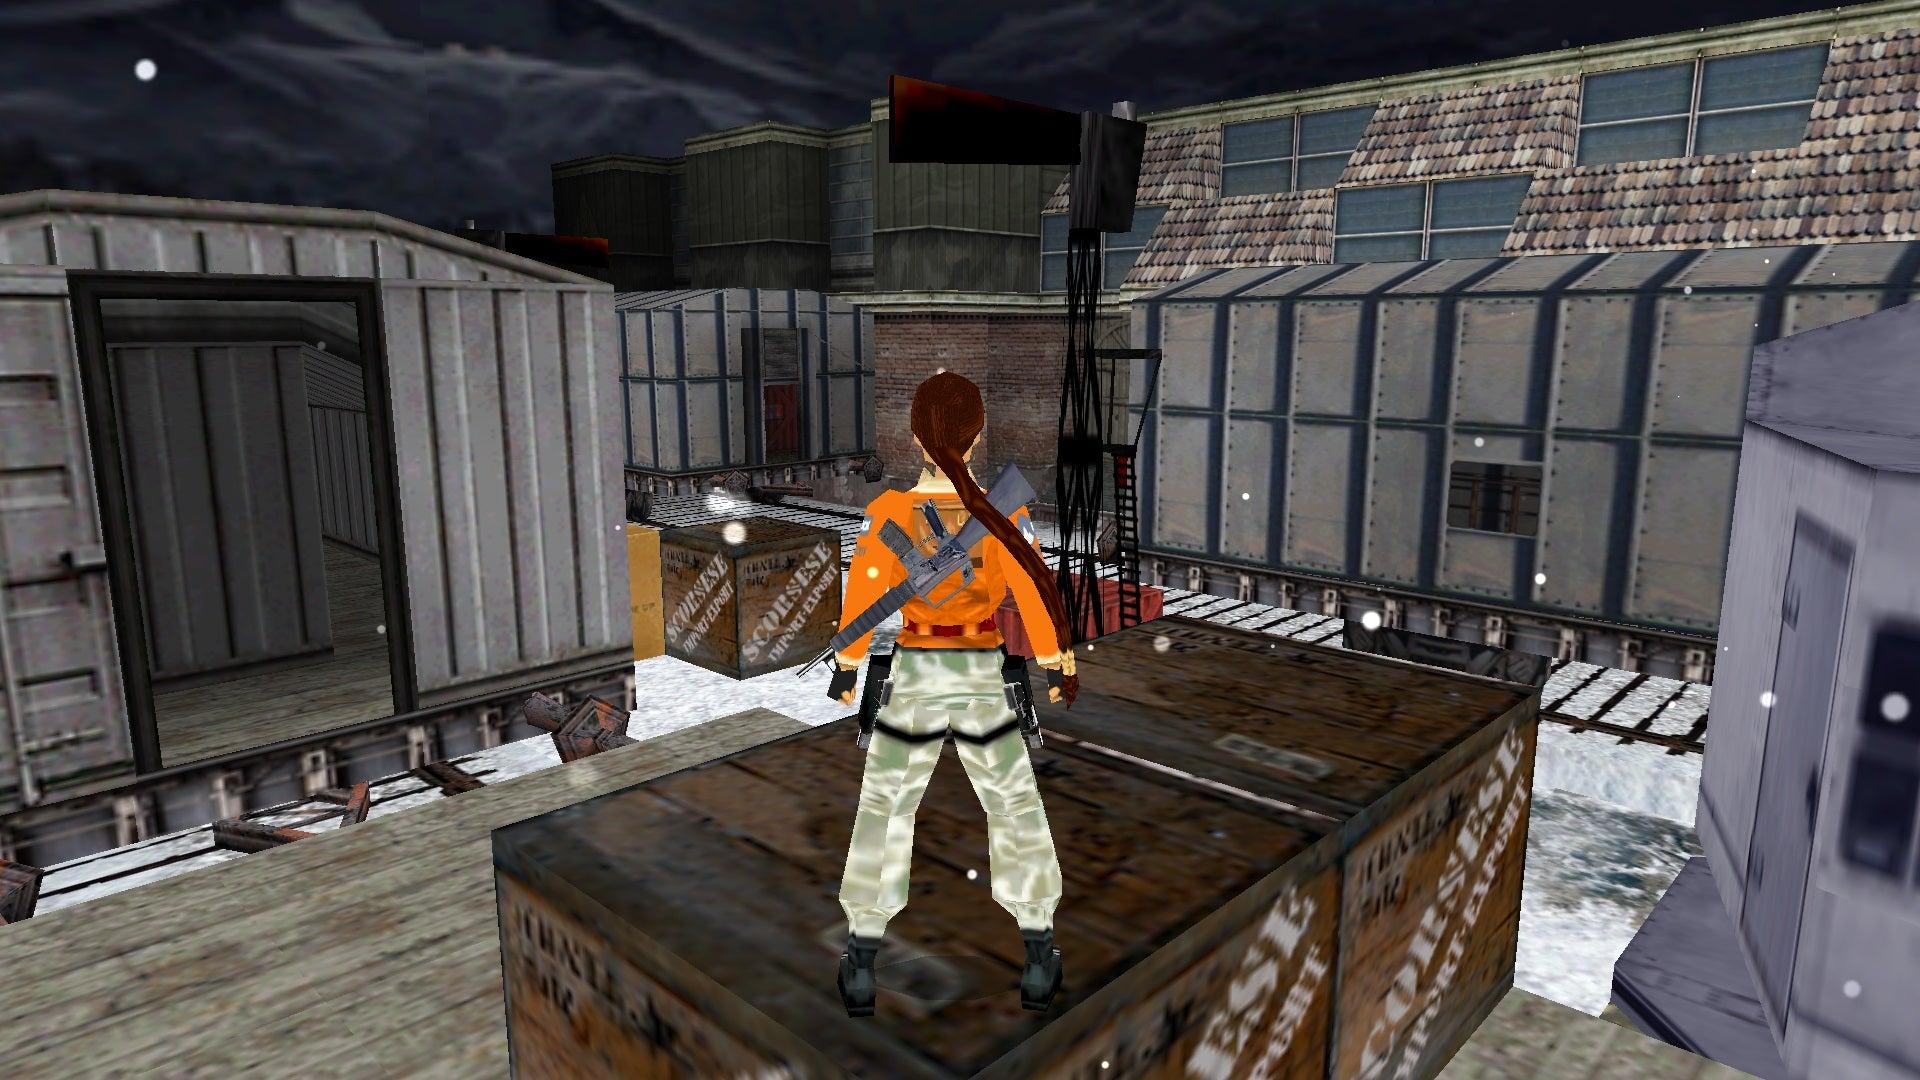 A screenshot from the Tomb Raider custom level called Train Courtyard